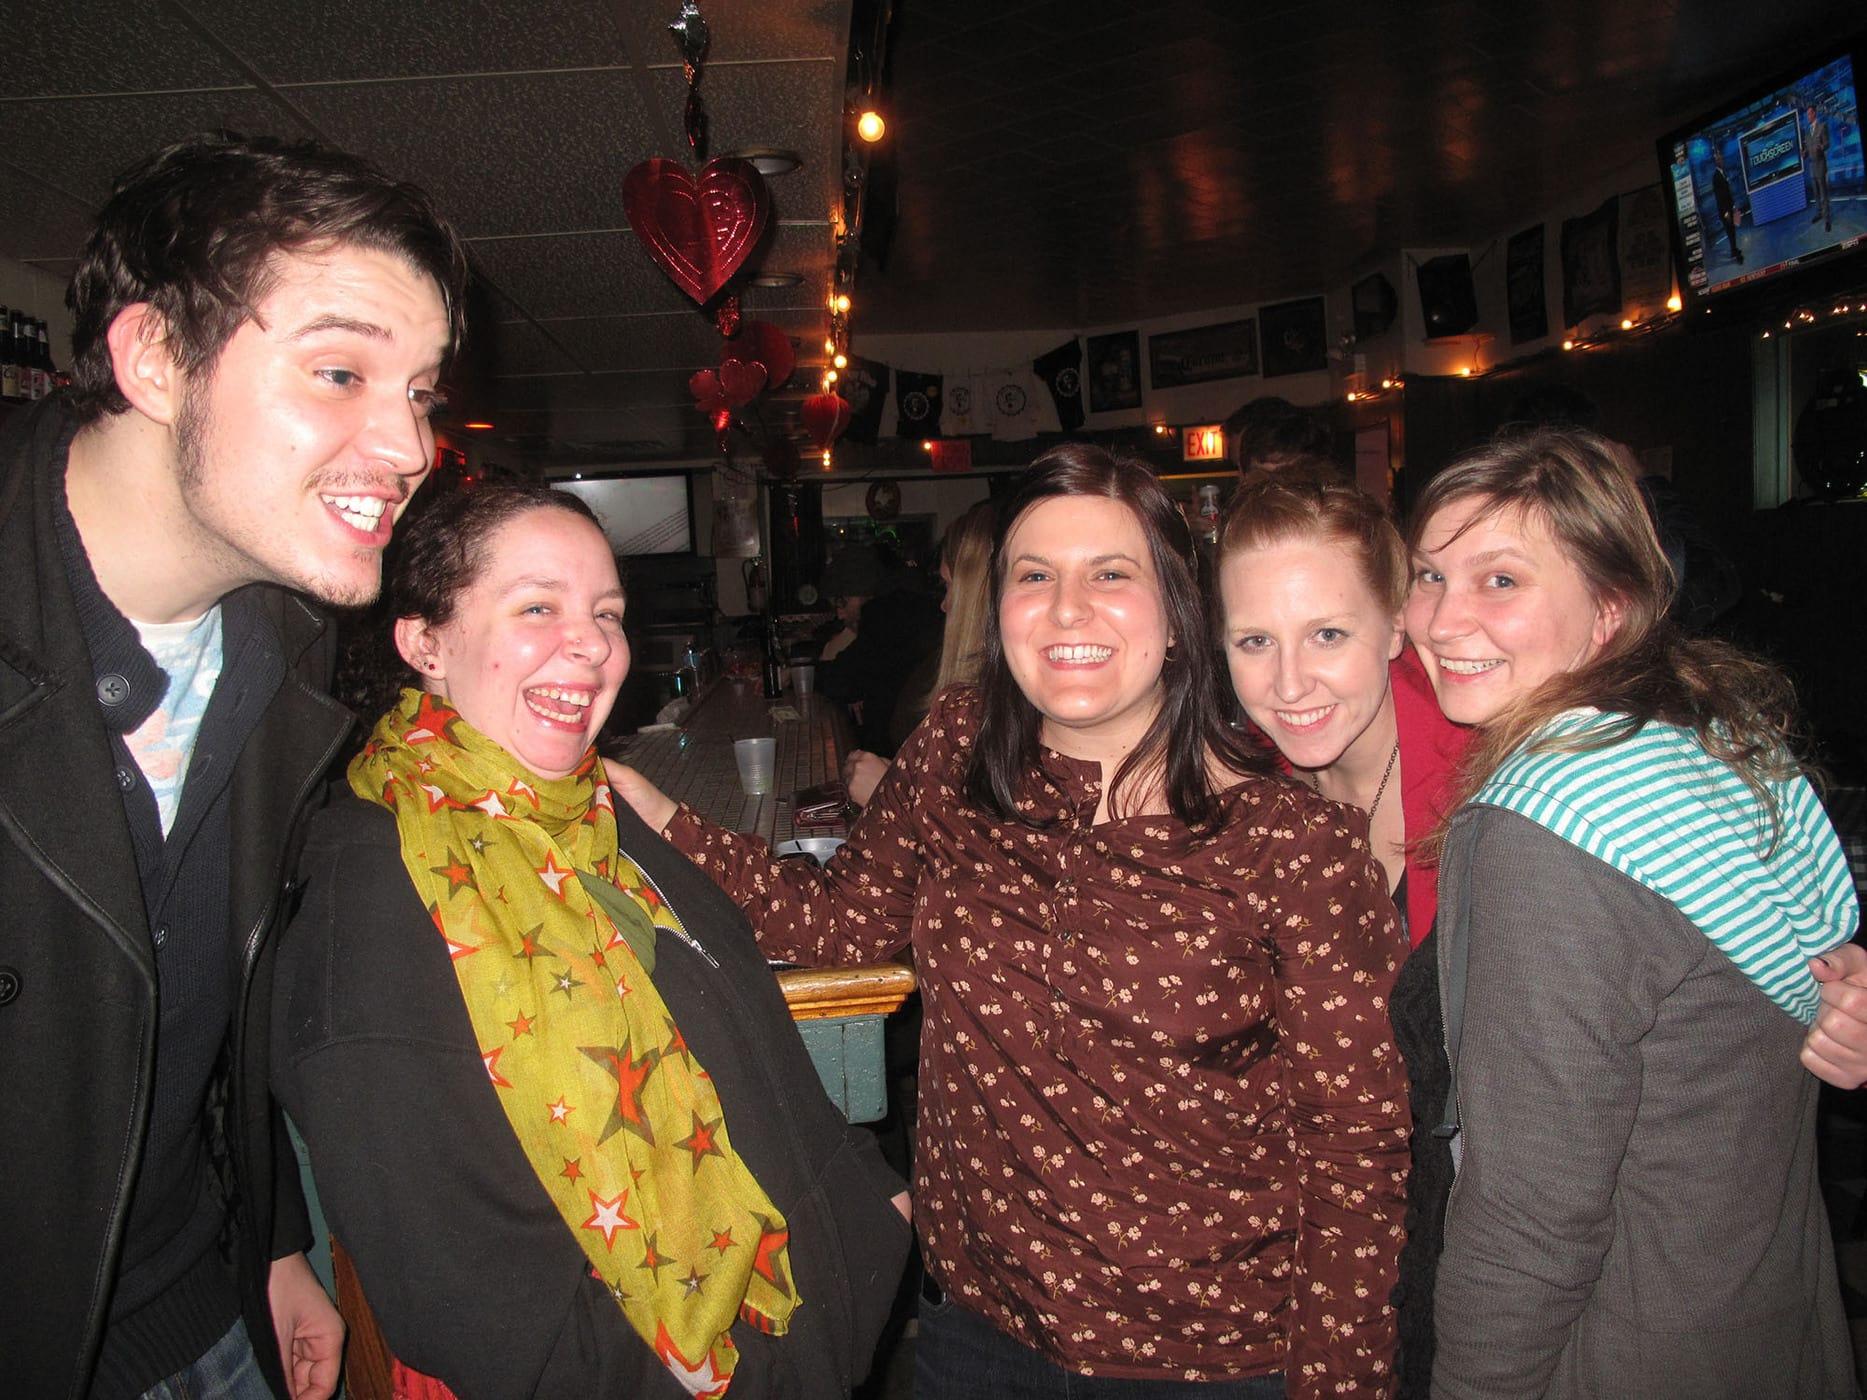 Birthday celebration at Happy Village in Chicago, Illinois